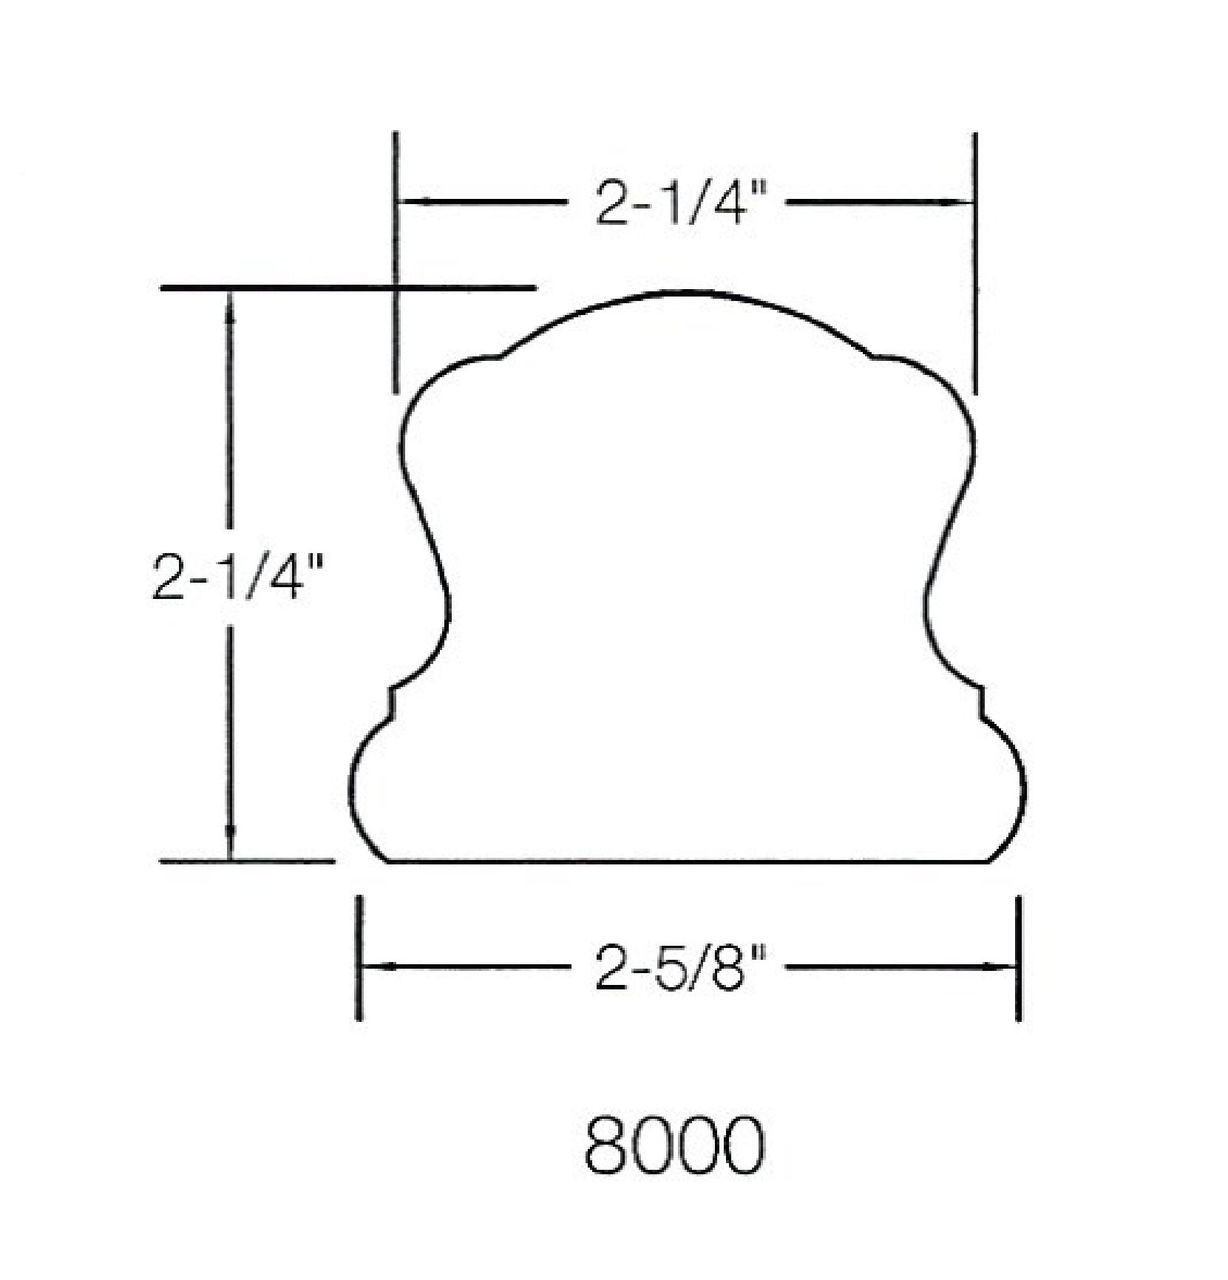 8000 Handrail Dimensional Information